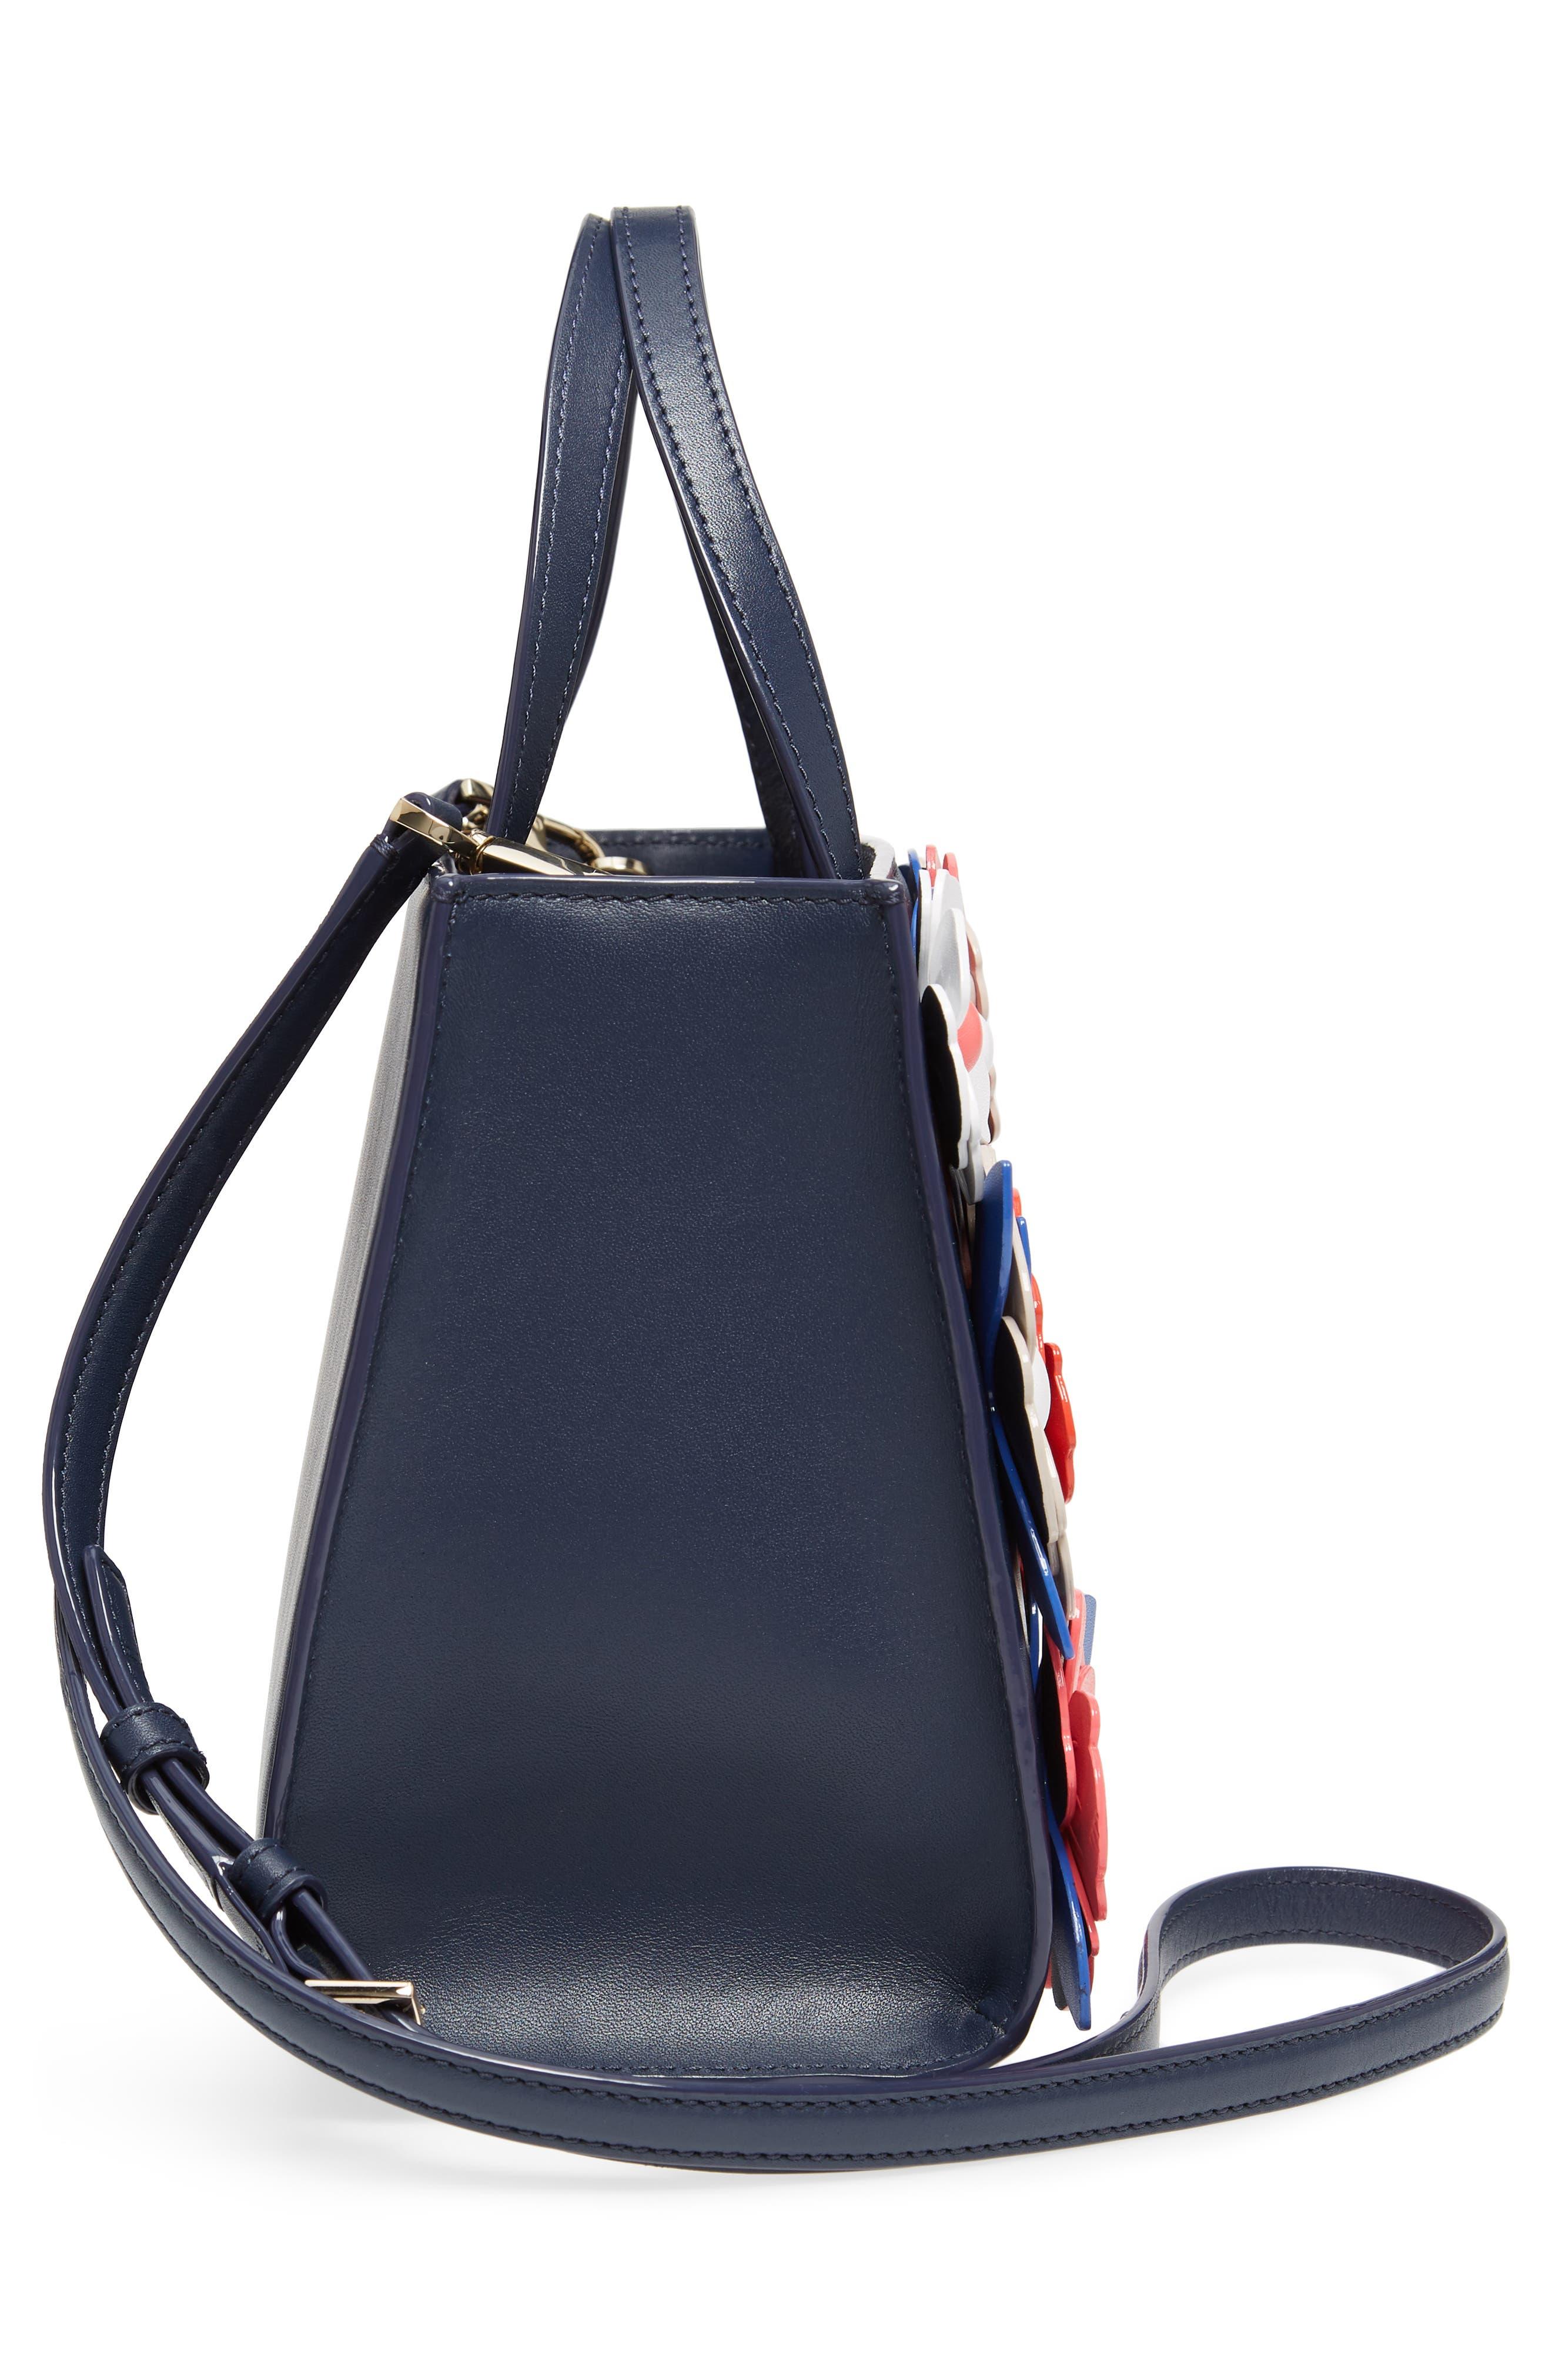 madison daisy lane – sam leather handbag,                             Alternate thumbnail 5, color,                             400